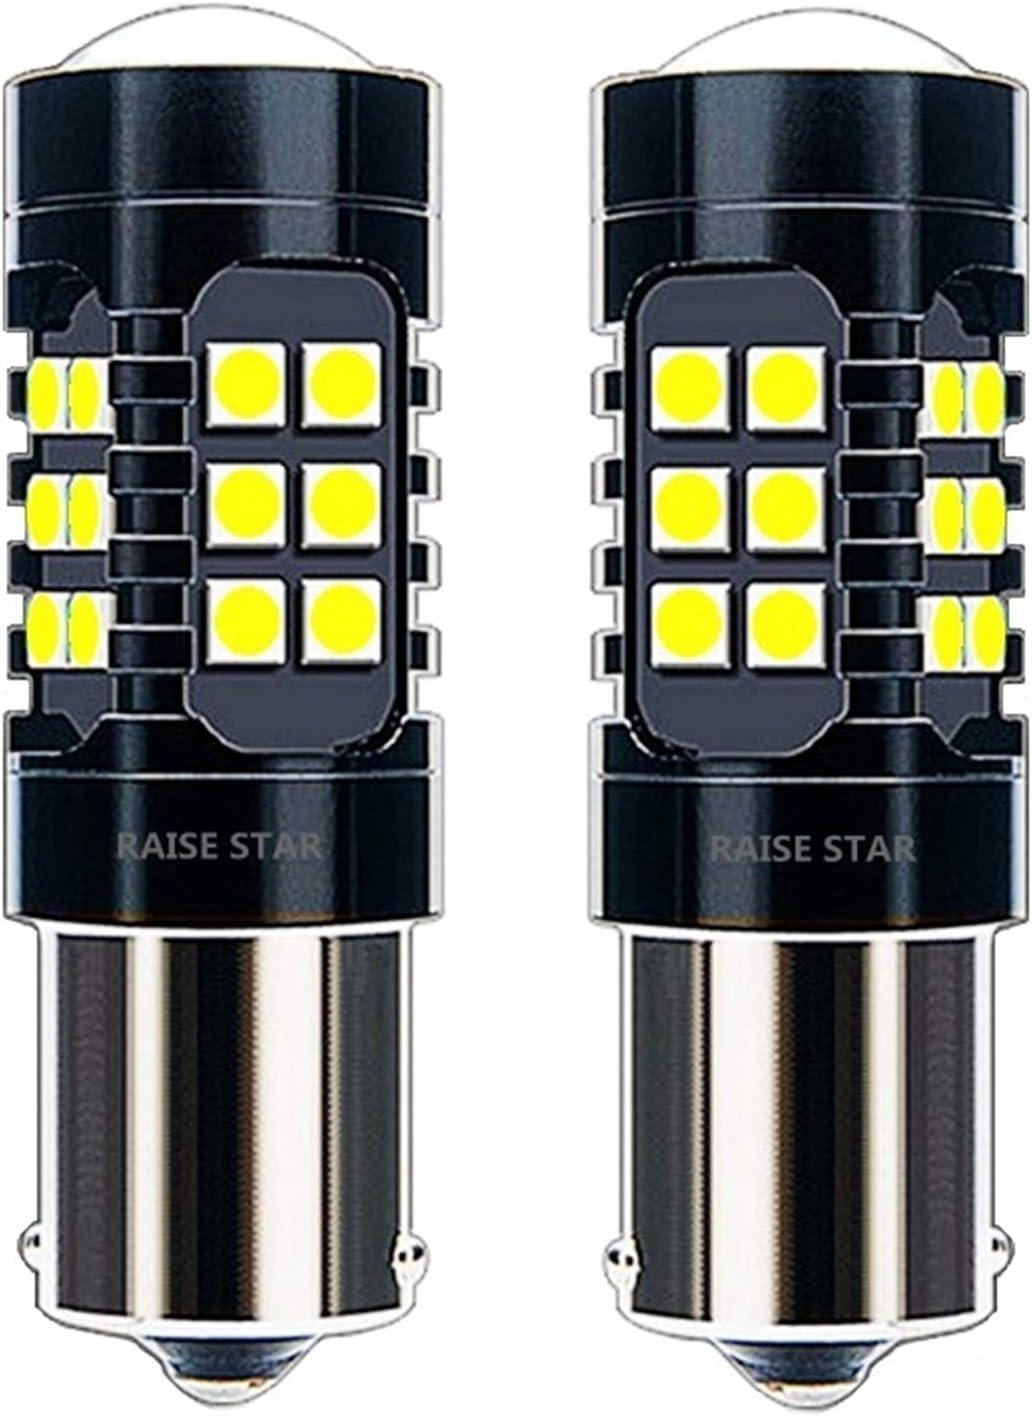 ShawnBlue Light 2pcs 1156 BA15S Super 1200Lm 3030 Undimmed Special Campaign P21W Cheap